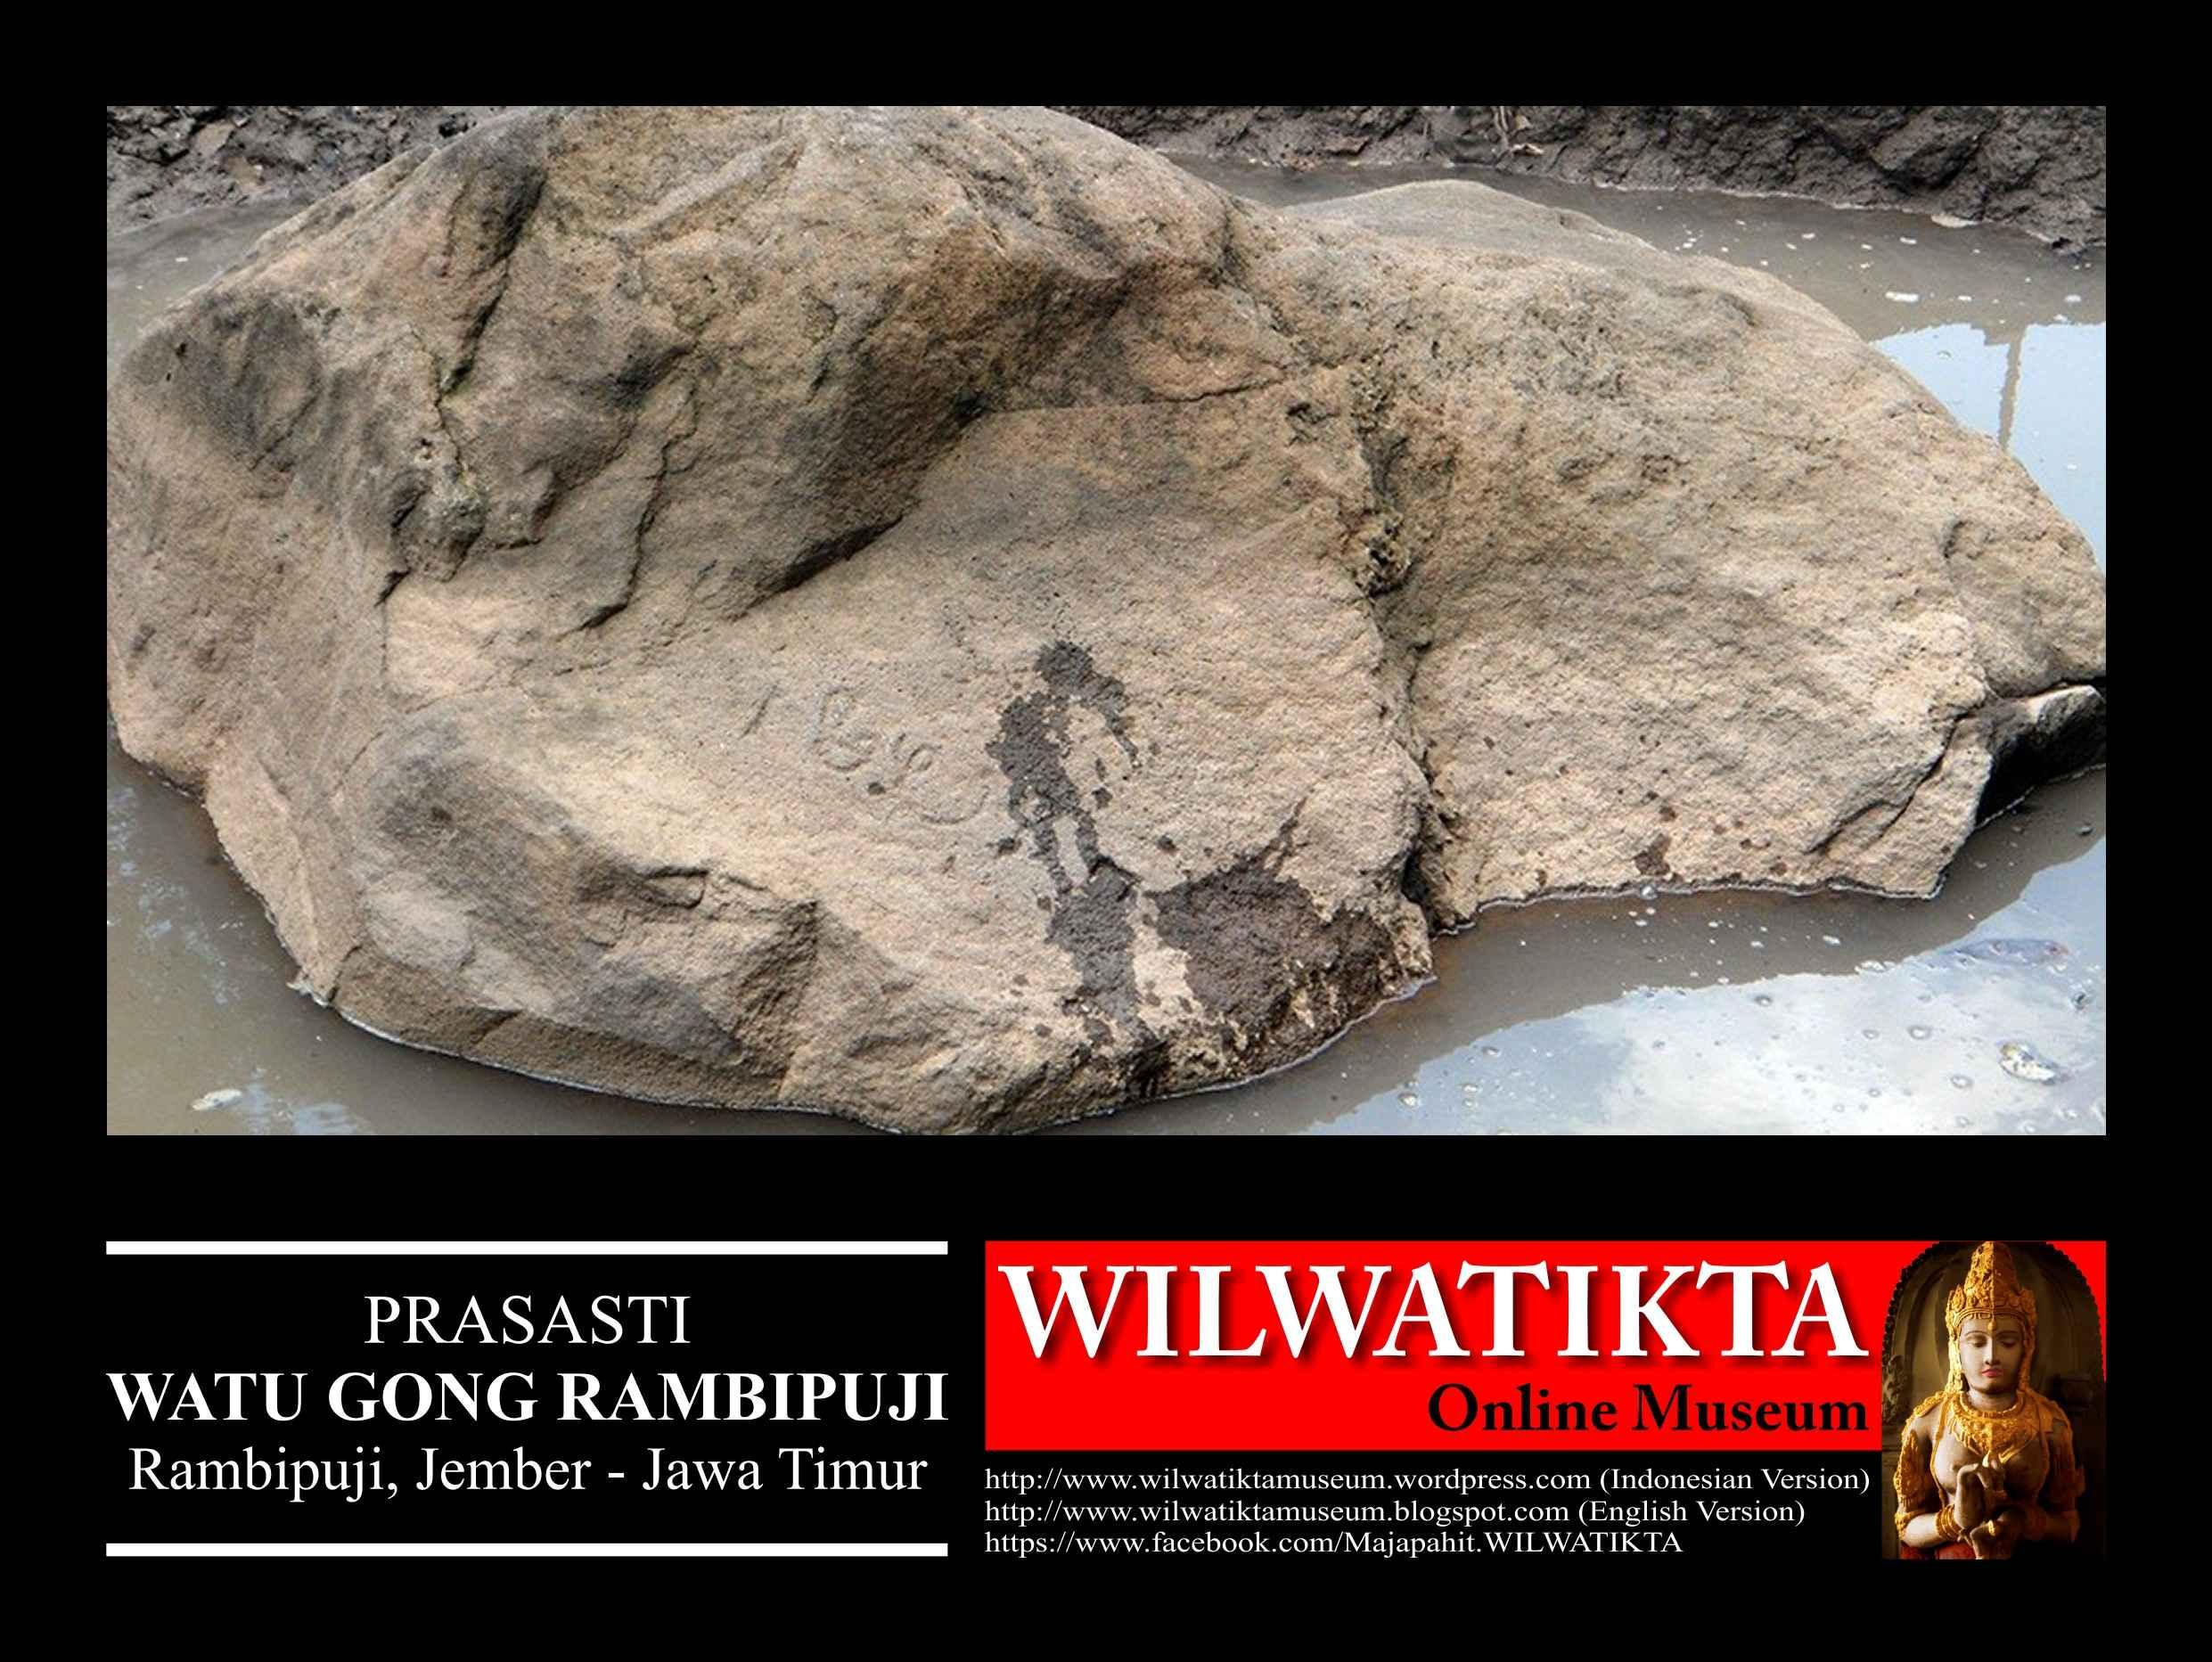 Watu Gong Rambipuji Wilwatikta Majapahit Prasasti Nusantara 003 Museum Huruf